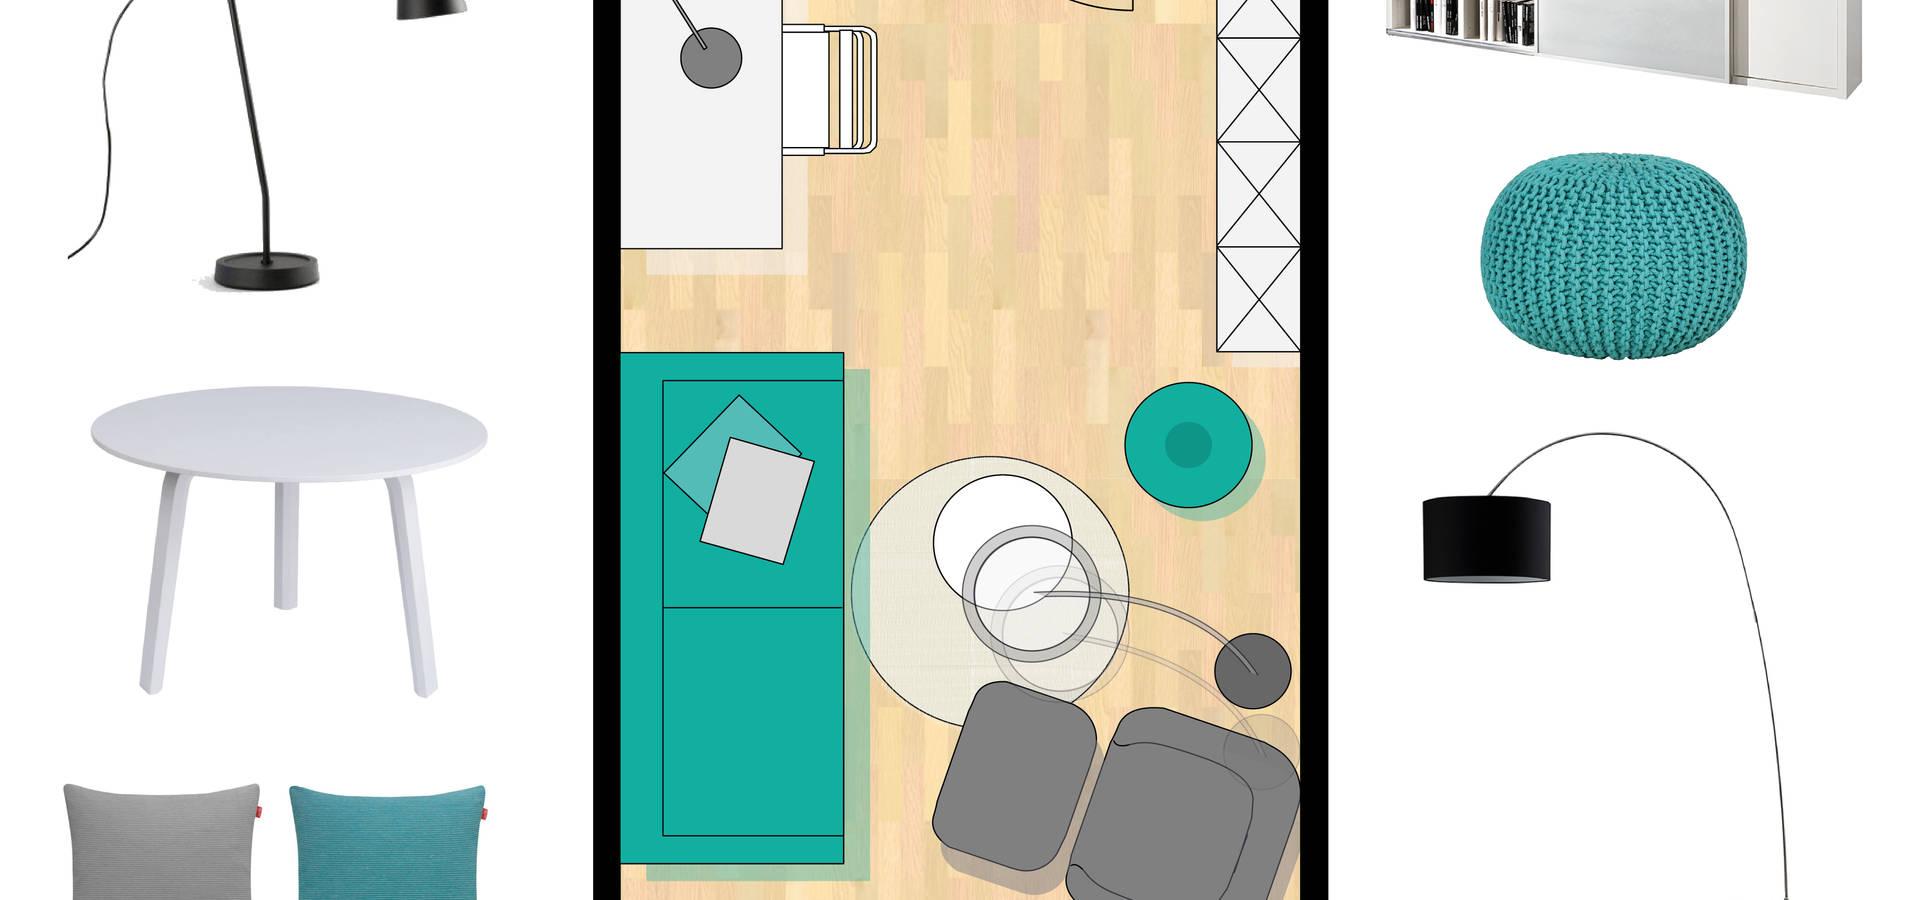 furnitects gmbh raumausstatter interior designer in. Black Bedroom Furniture Sets. Home Design Ideas